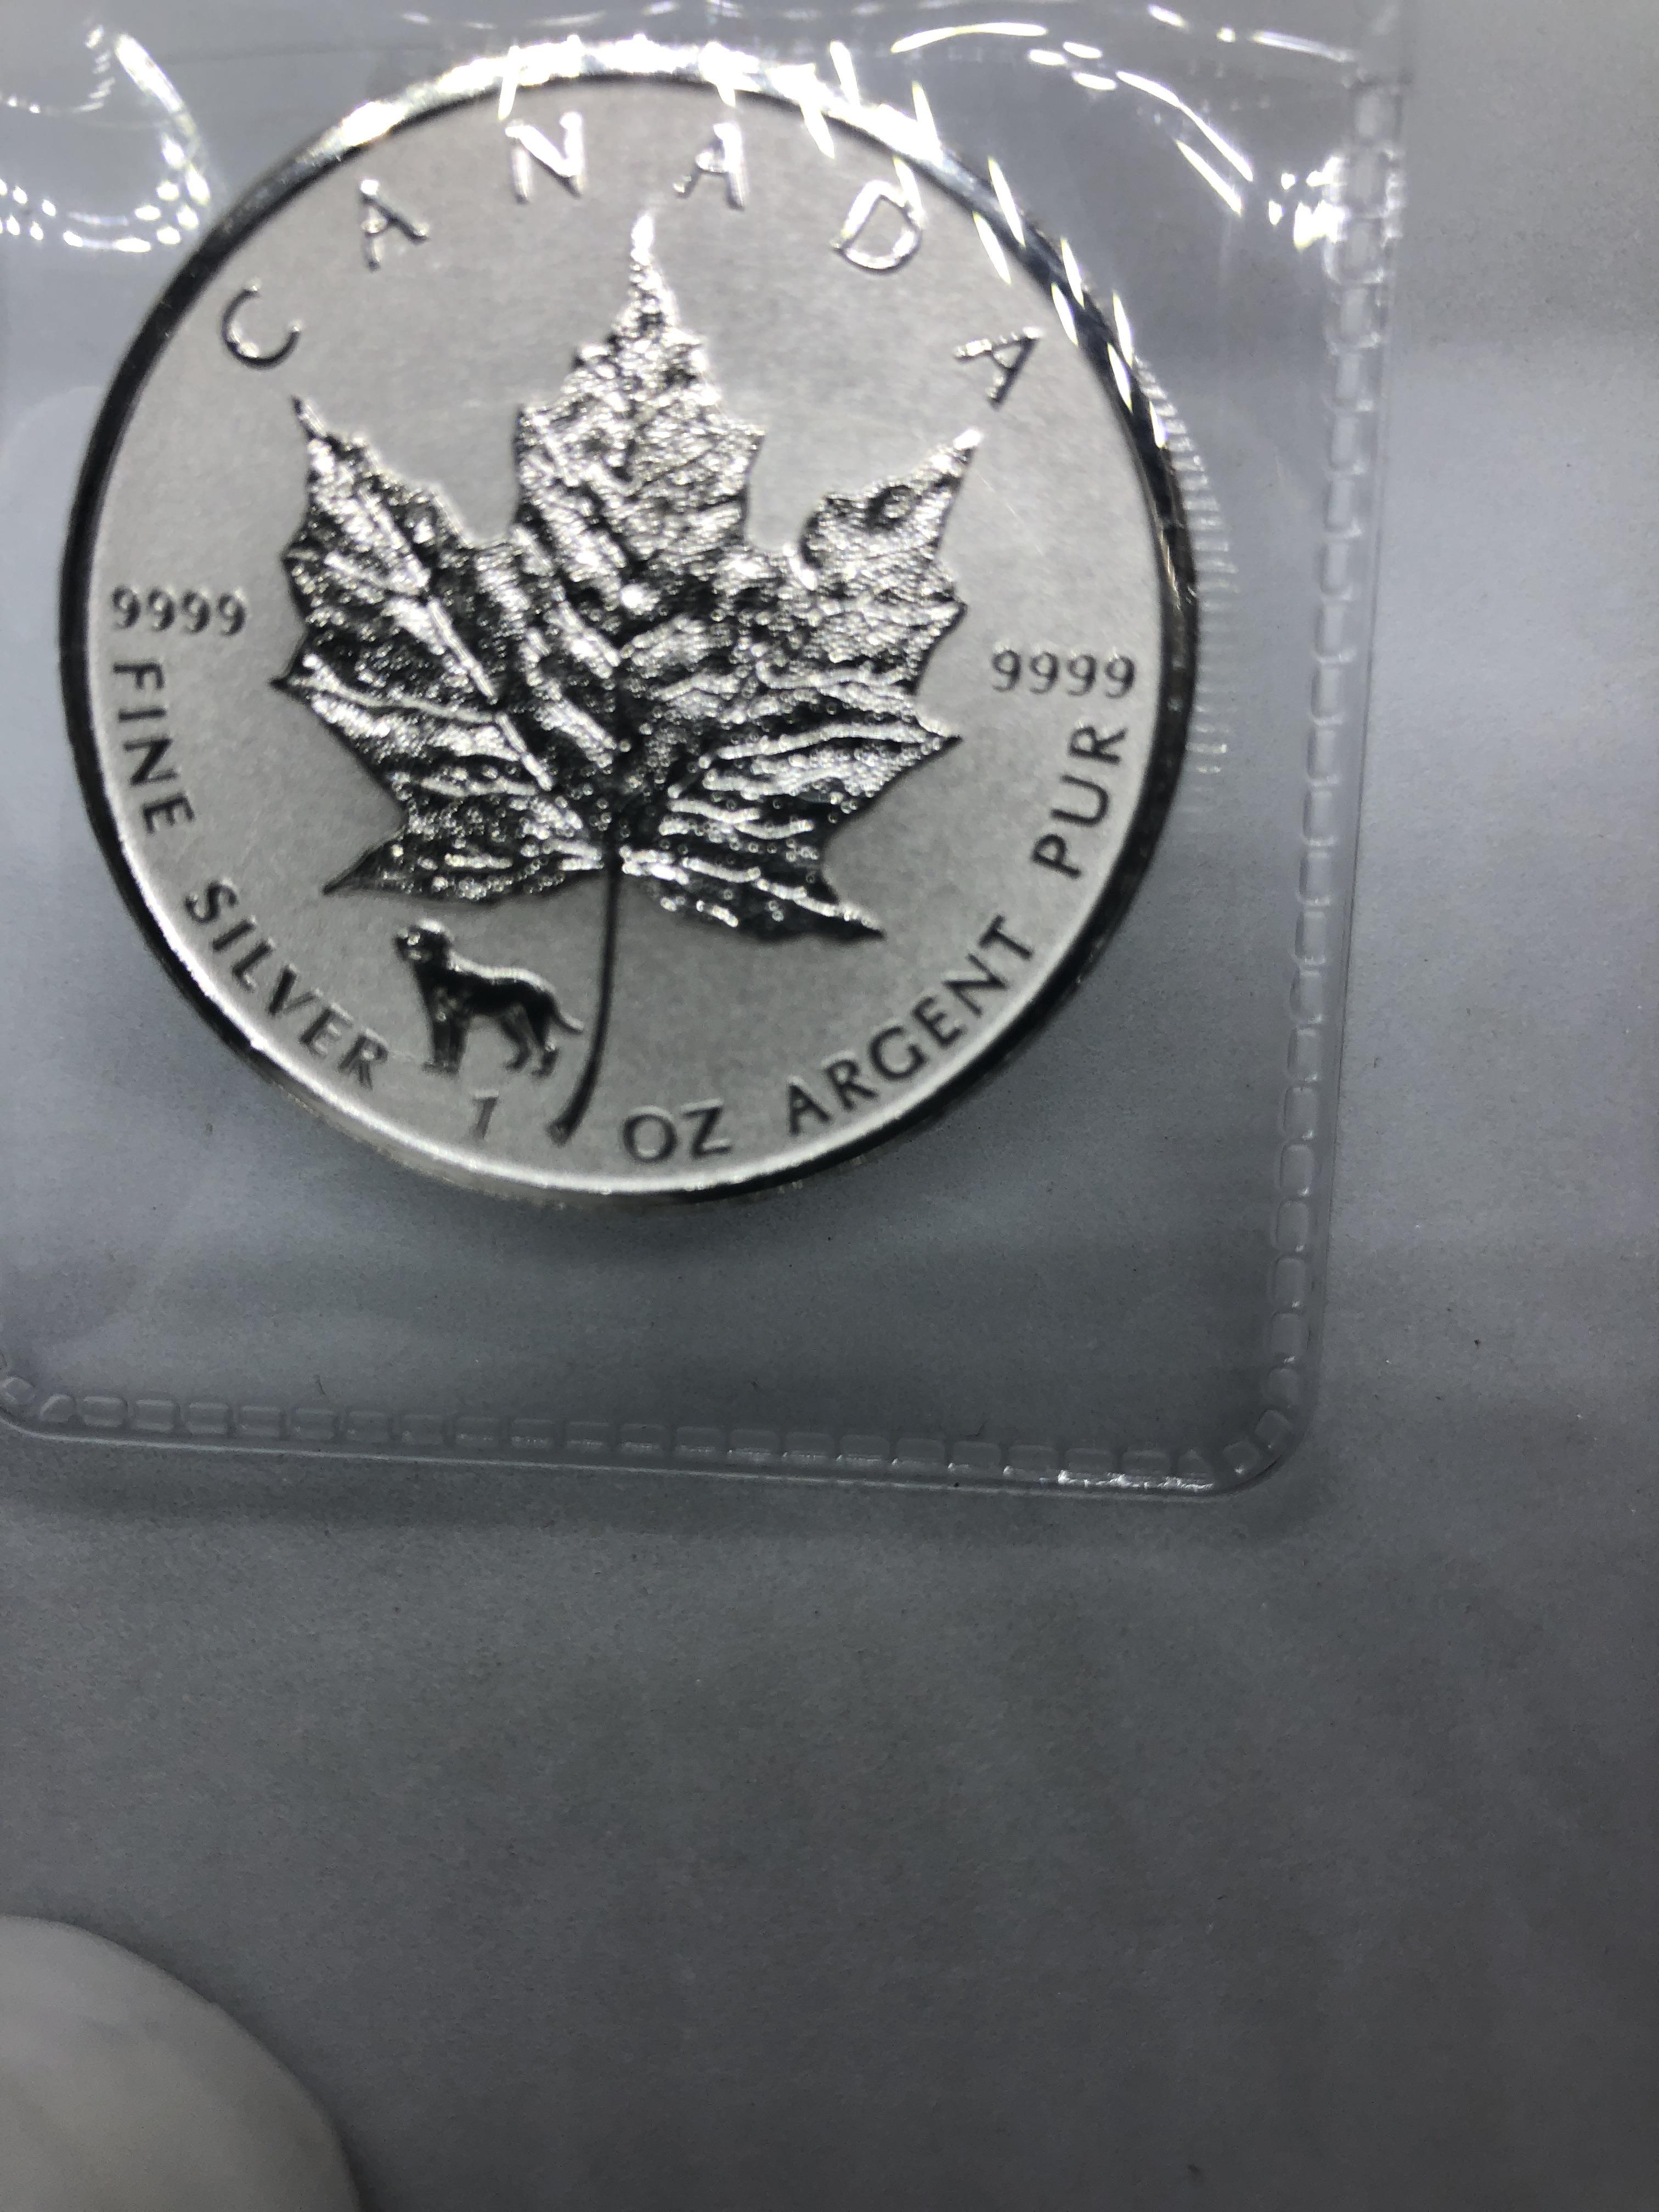 2018 $5 CAD Reverse Proof 1 Oz Silver-Dog Prvcy